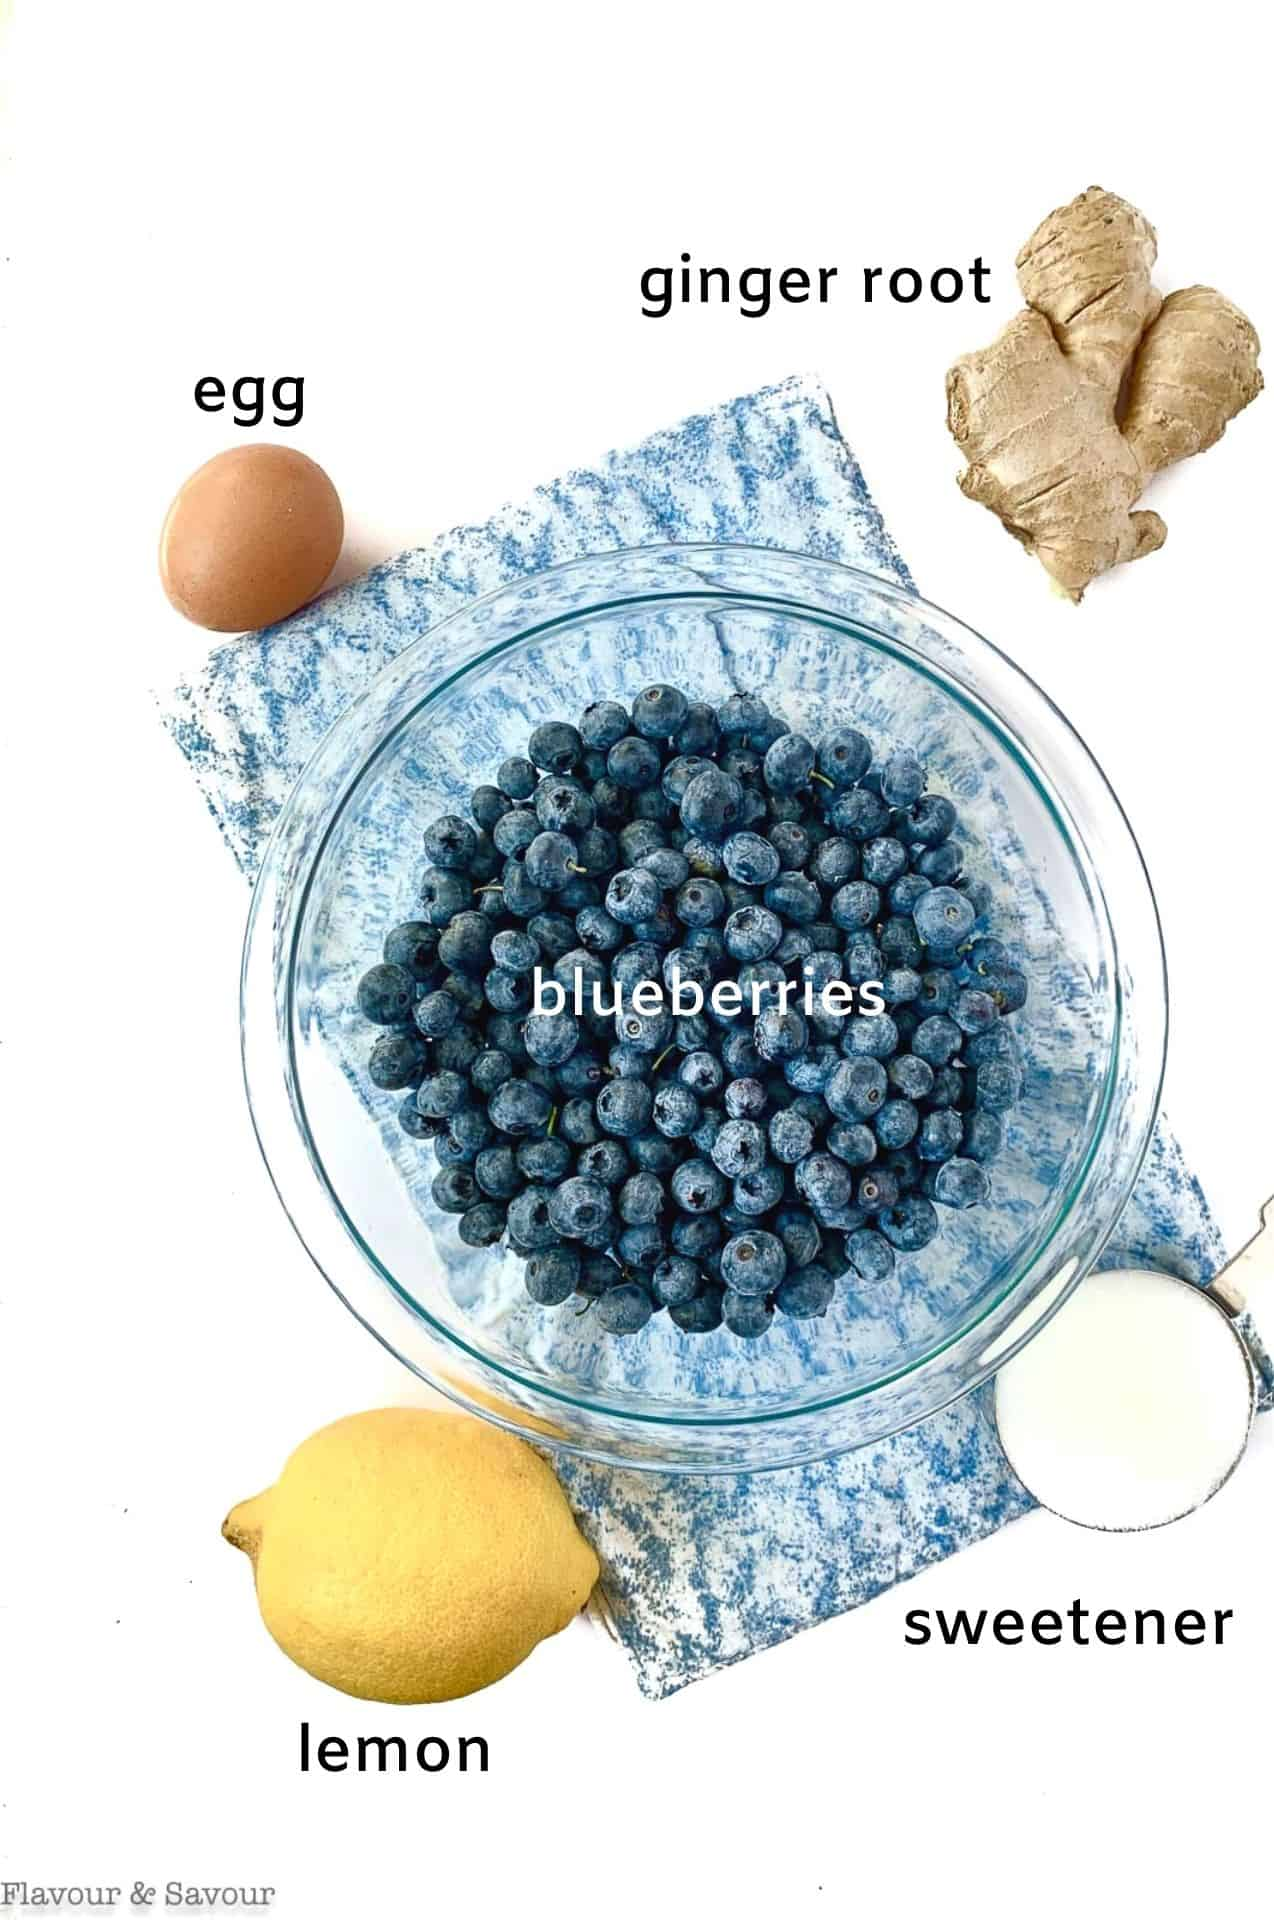 Labeled ingredients for Blueberry Lemon Ginger Galette